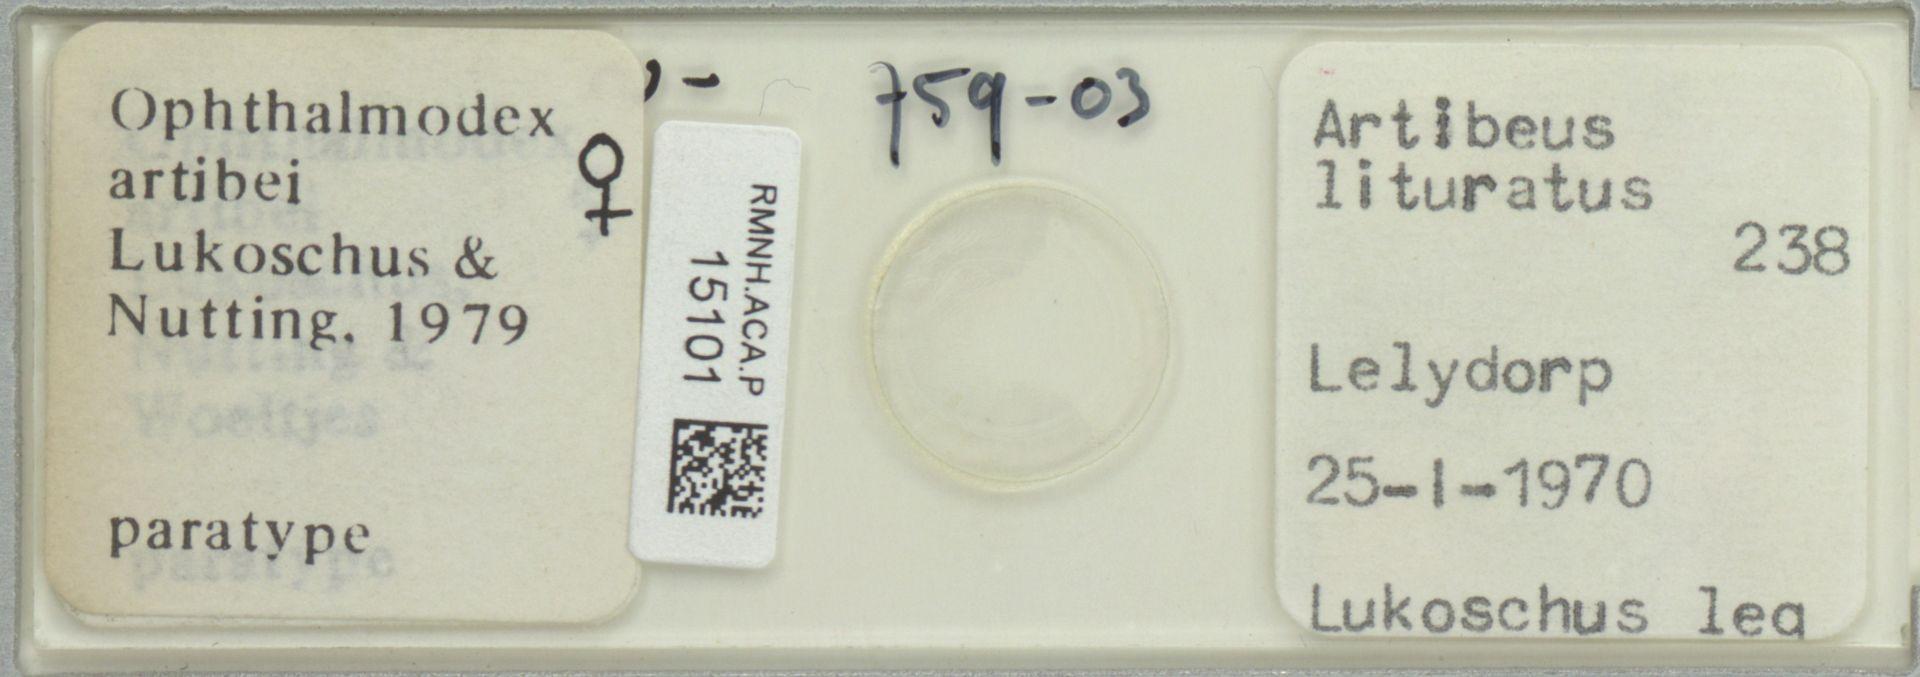 RMNH.ACA.P.15101   Ophthalmodex artibei Lukoschus & Nutting, 1979